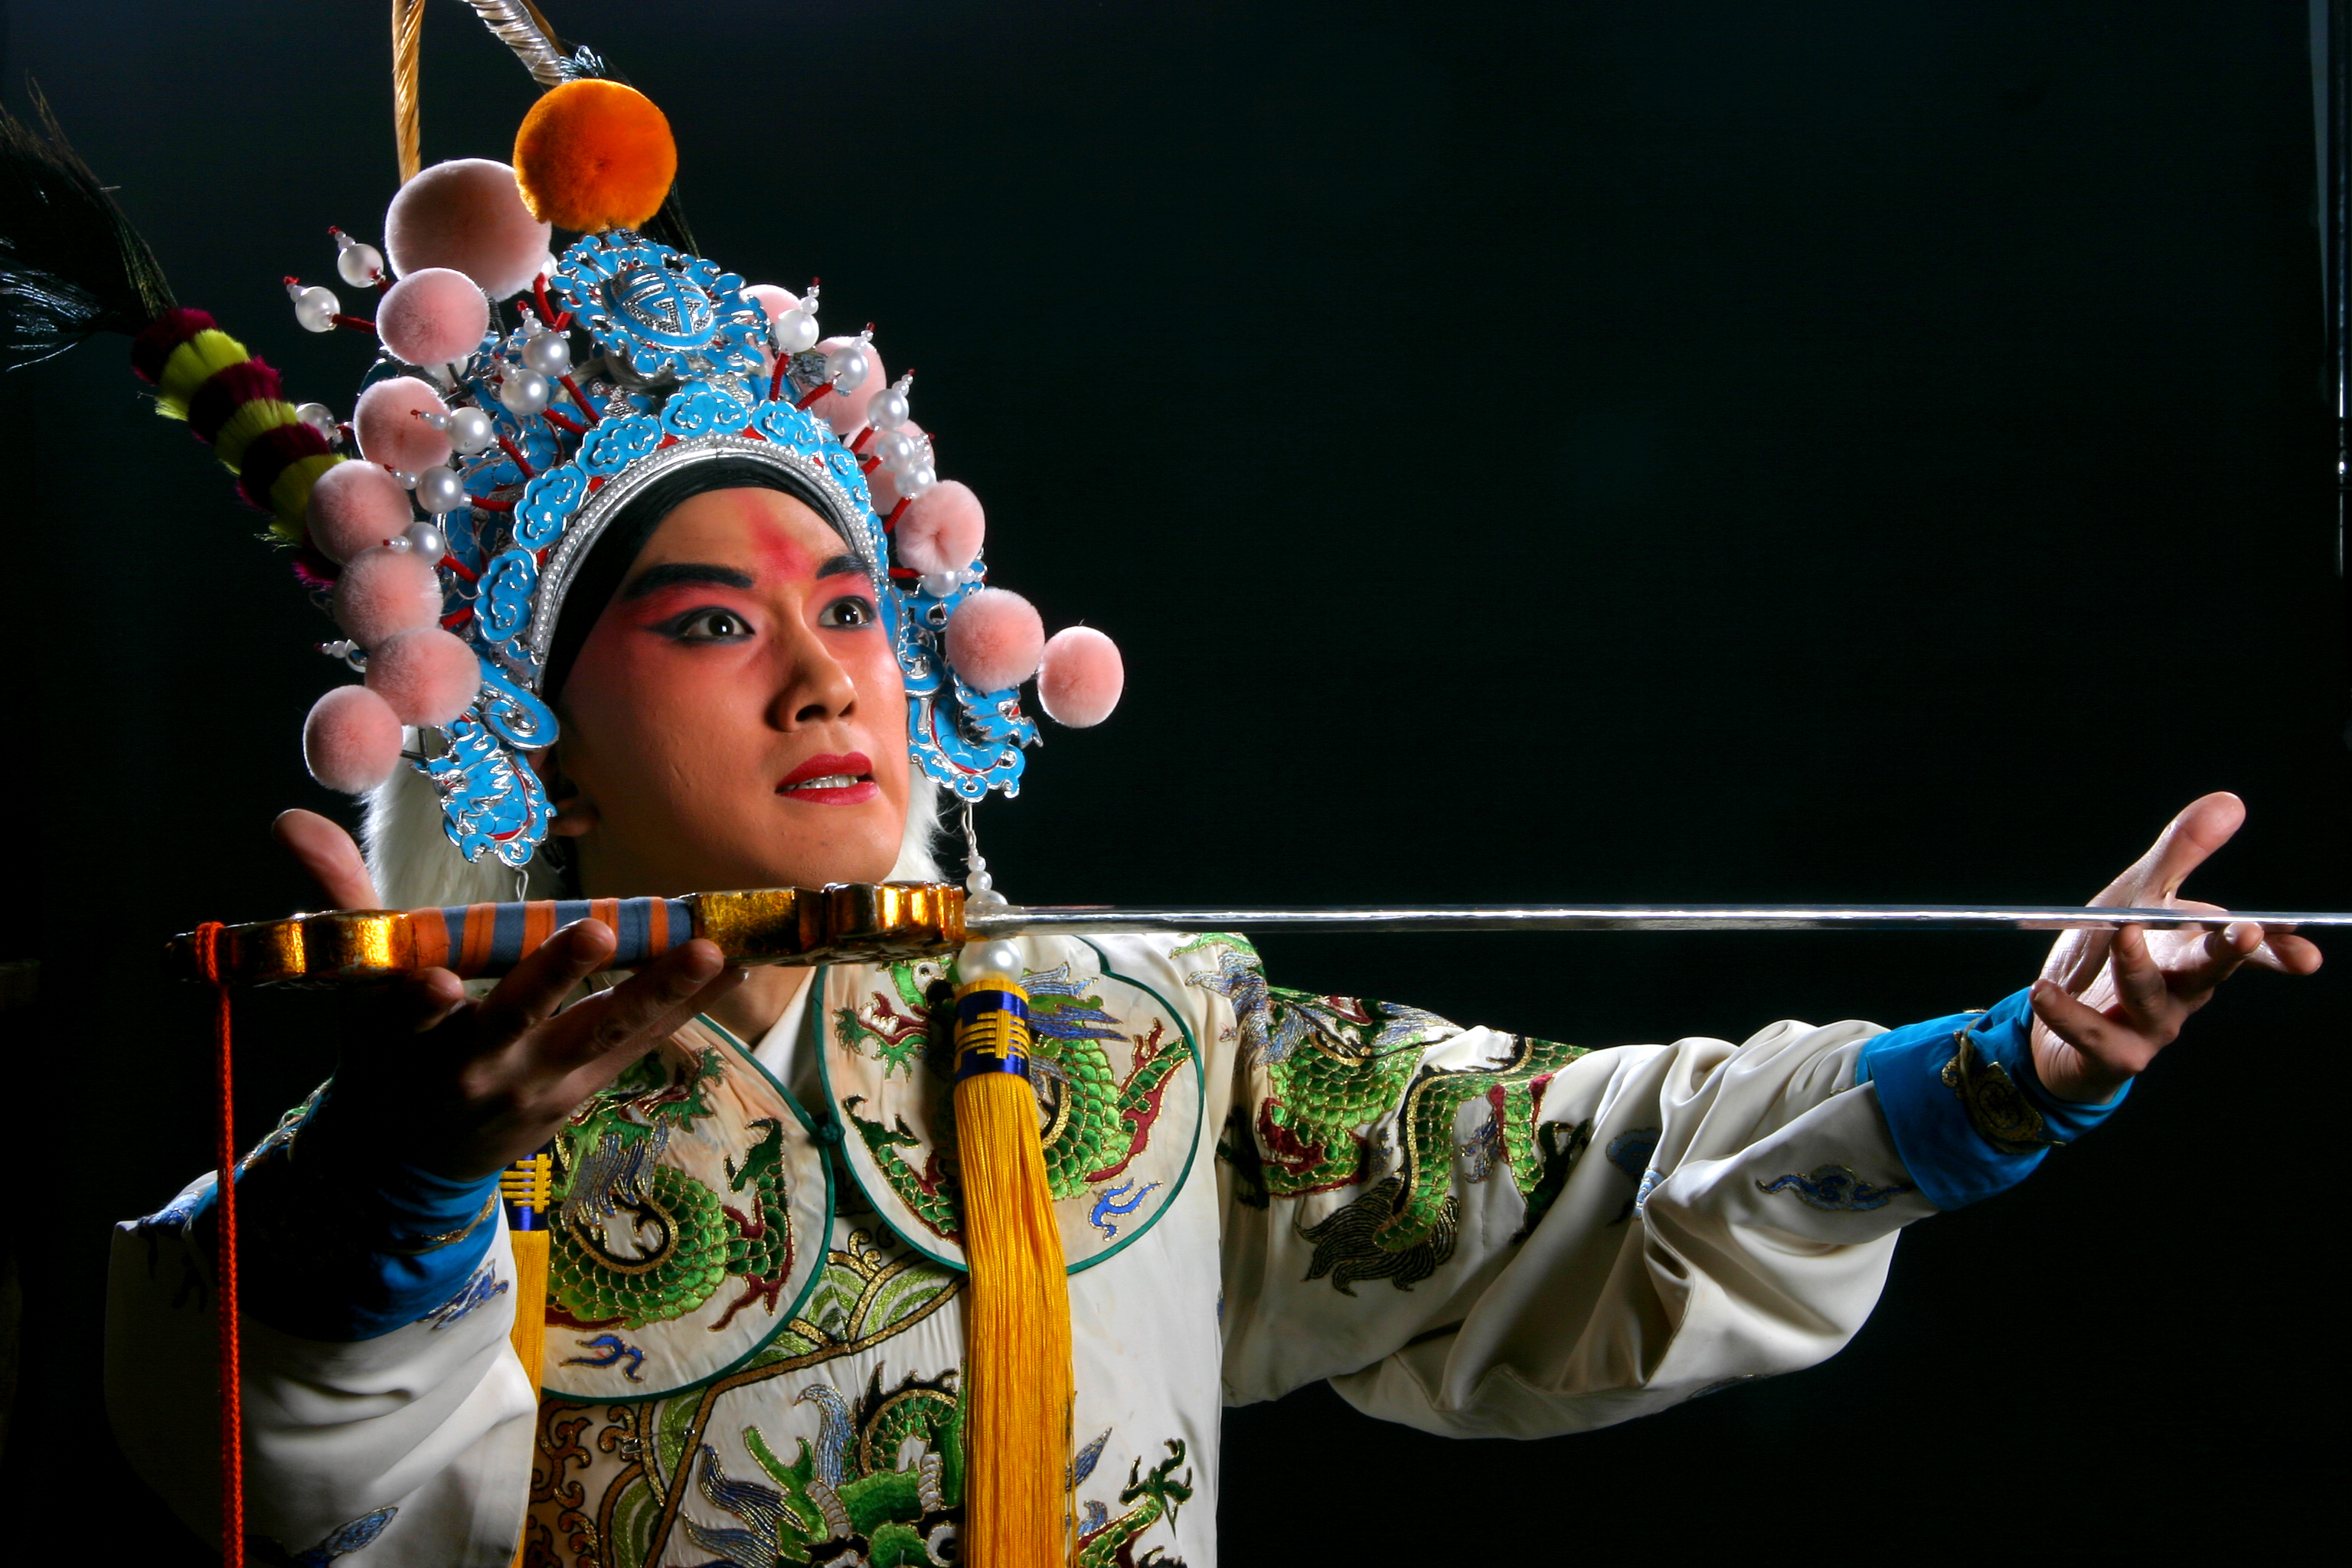 Hamlet-The-revenge-of-prince-zi-dan-promo-hamlet-foto-Shanghai Jingju Theatre Company